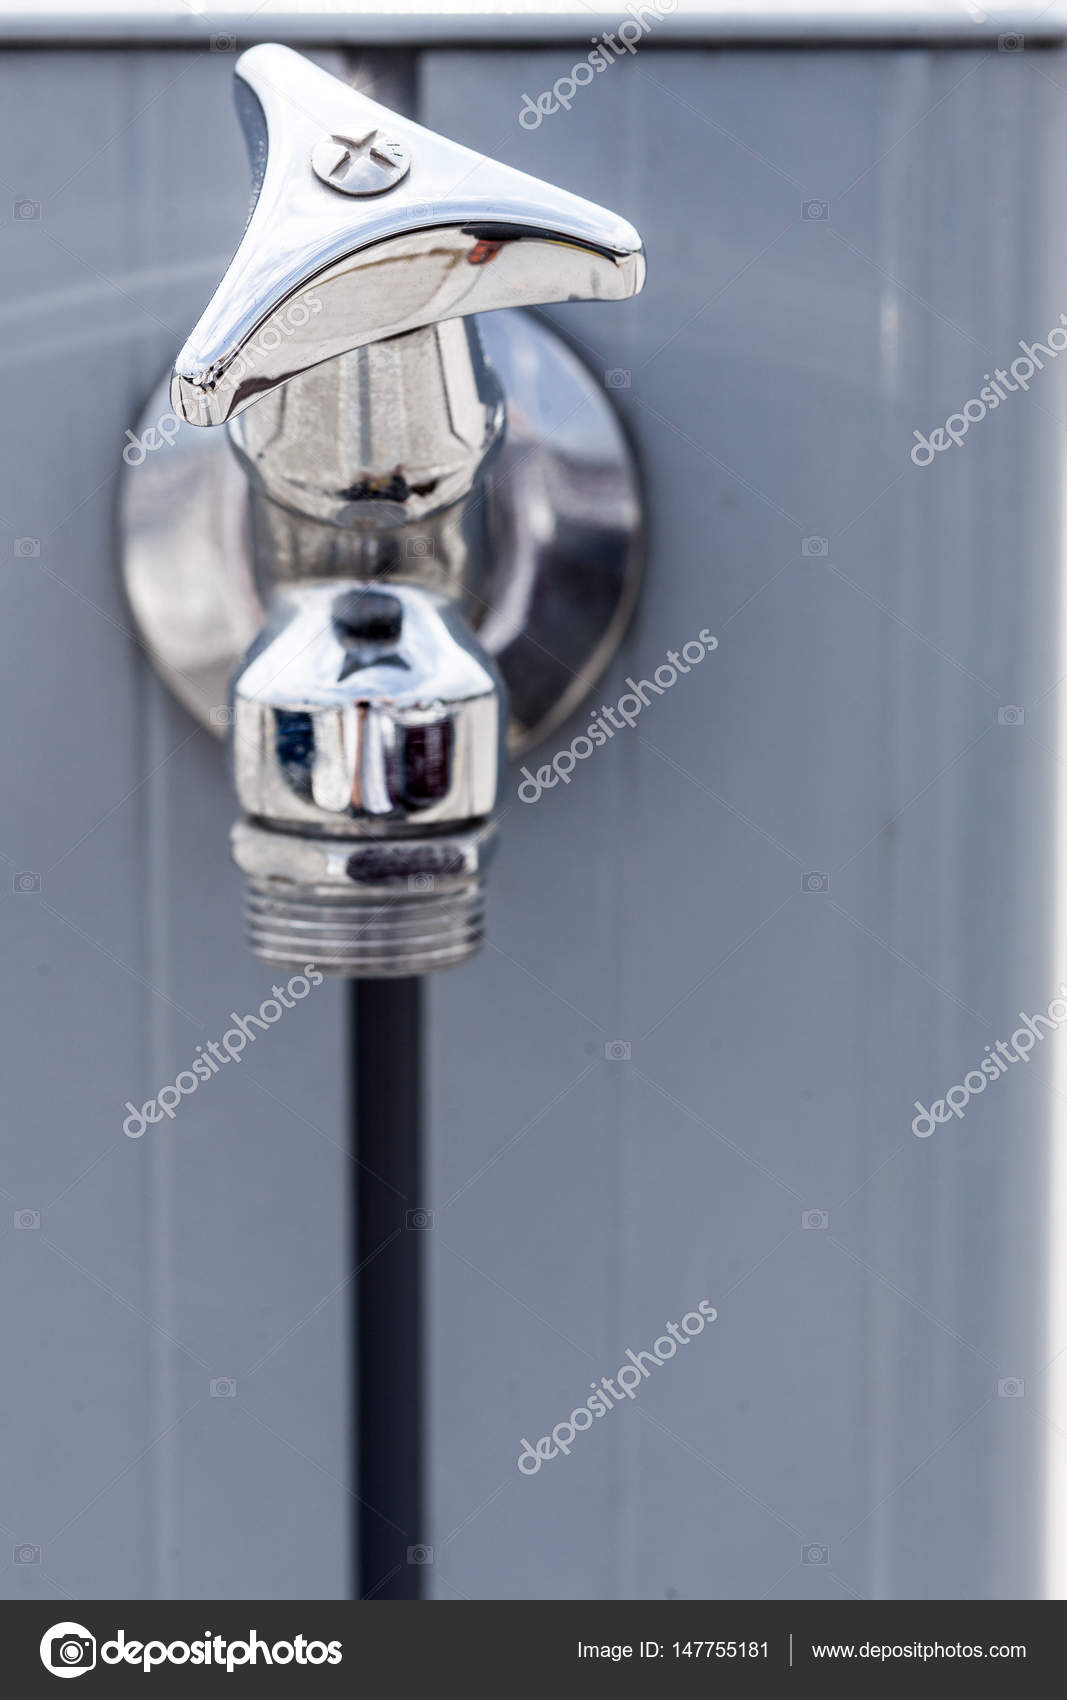 Delightful Small Metal Tap Water Outside U2014 Stock Photo